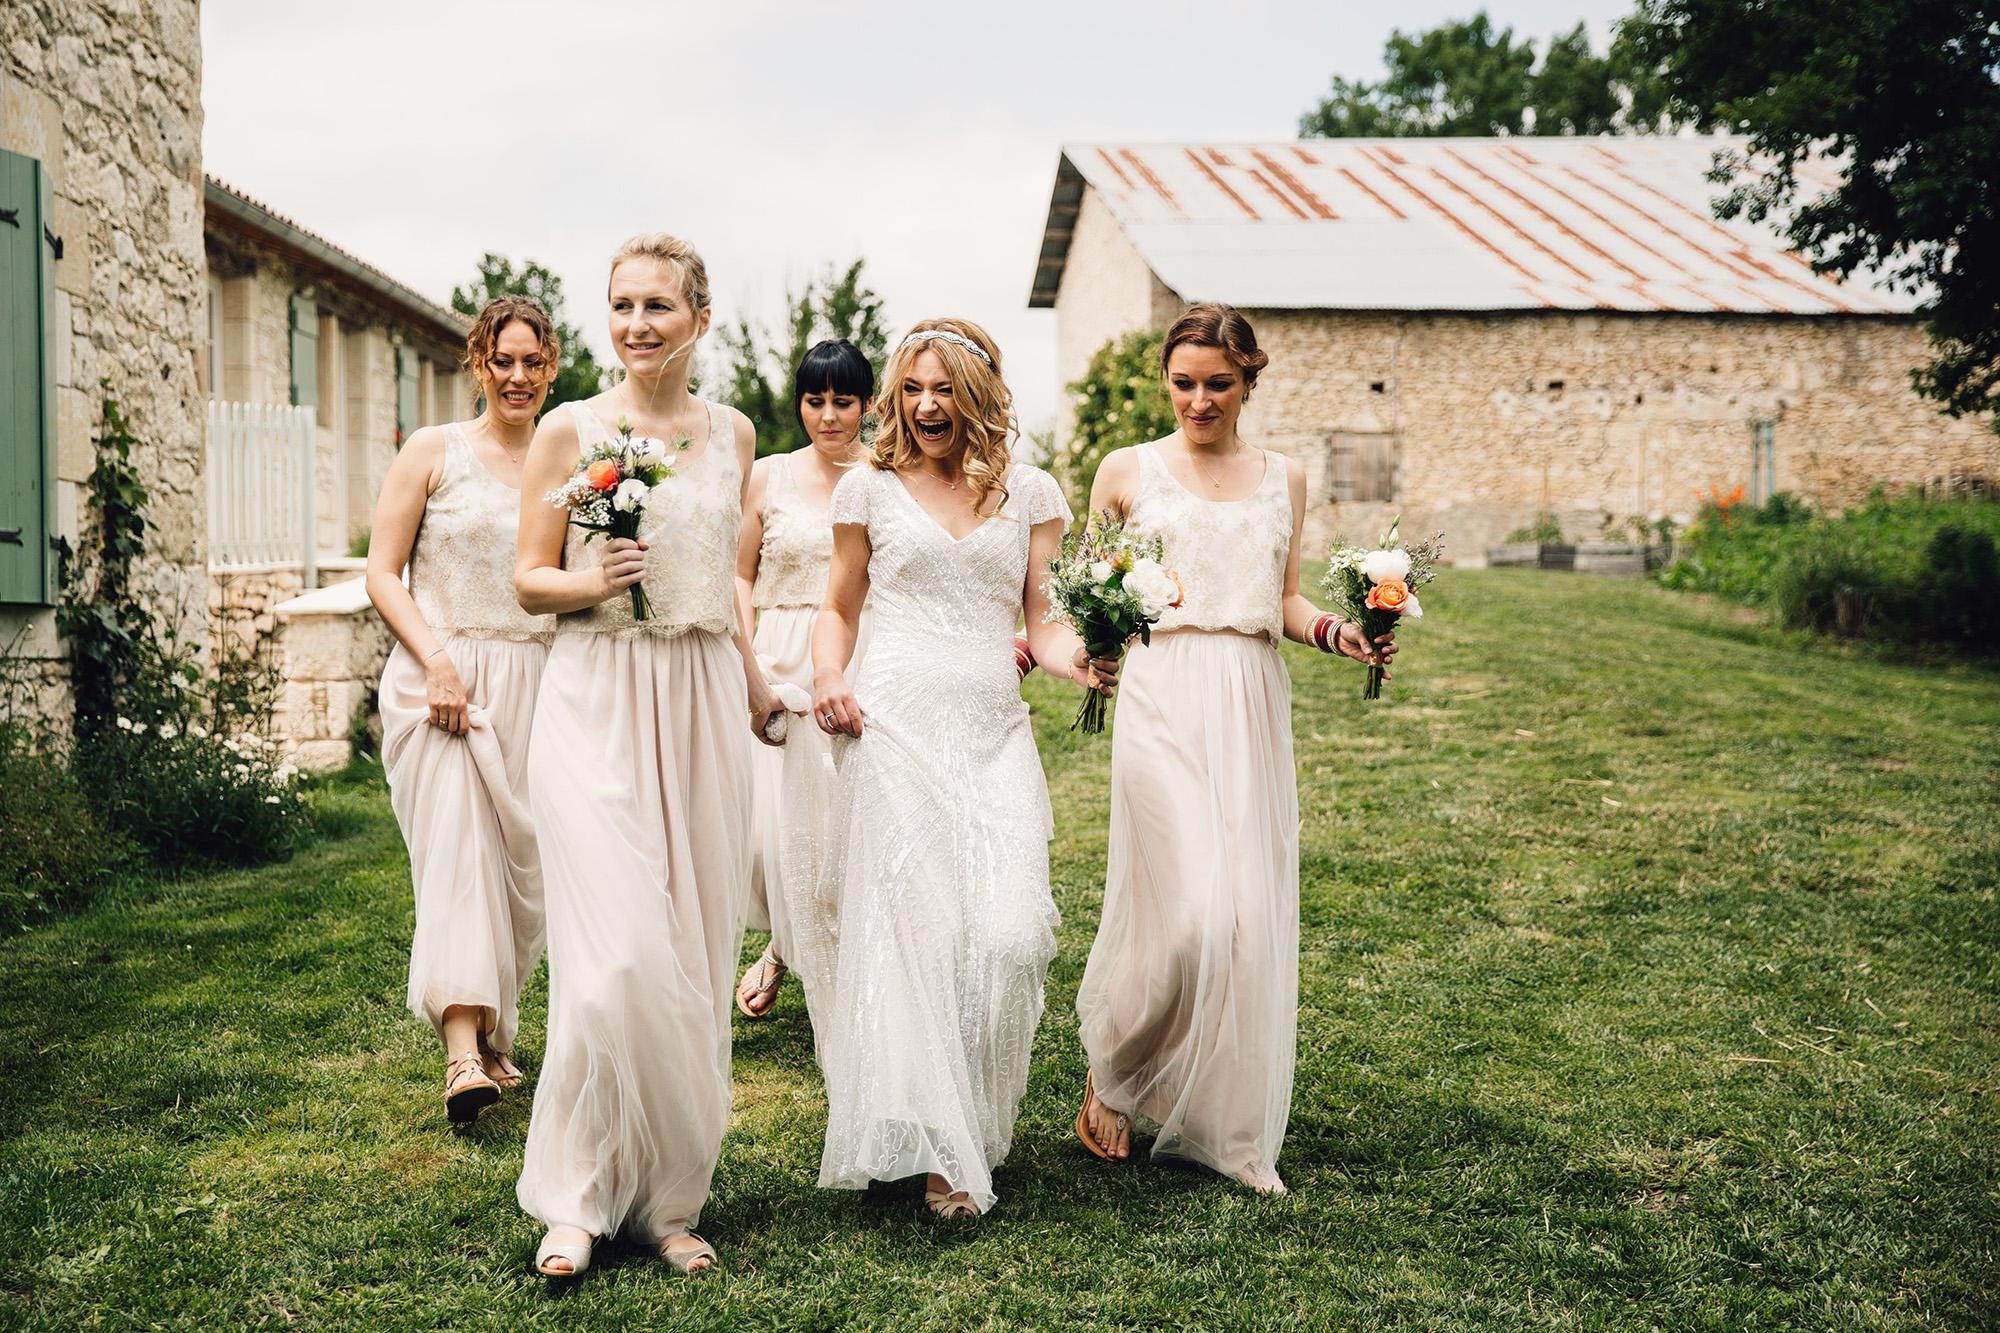 Hannah-Bespoke-Bridesmaids-Bohemian-French-Wedding-Gold-Lace-Susanna-Greening-Designs-Matlock-Derbyshire-4